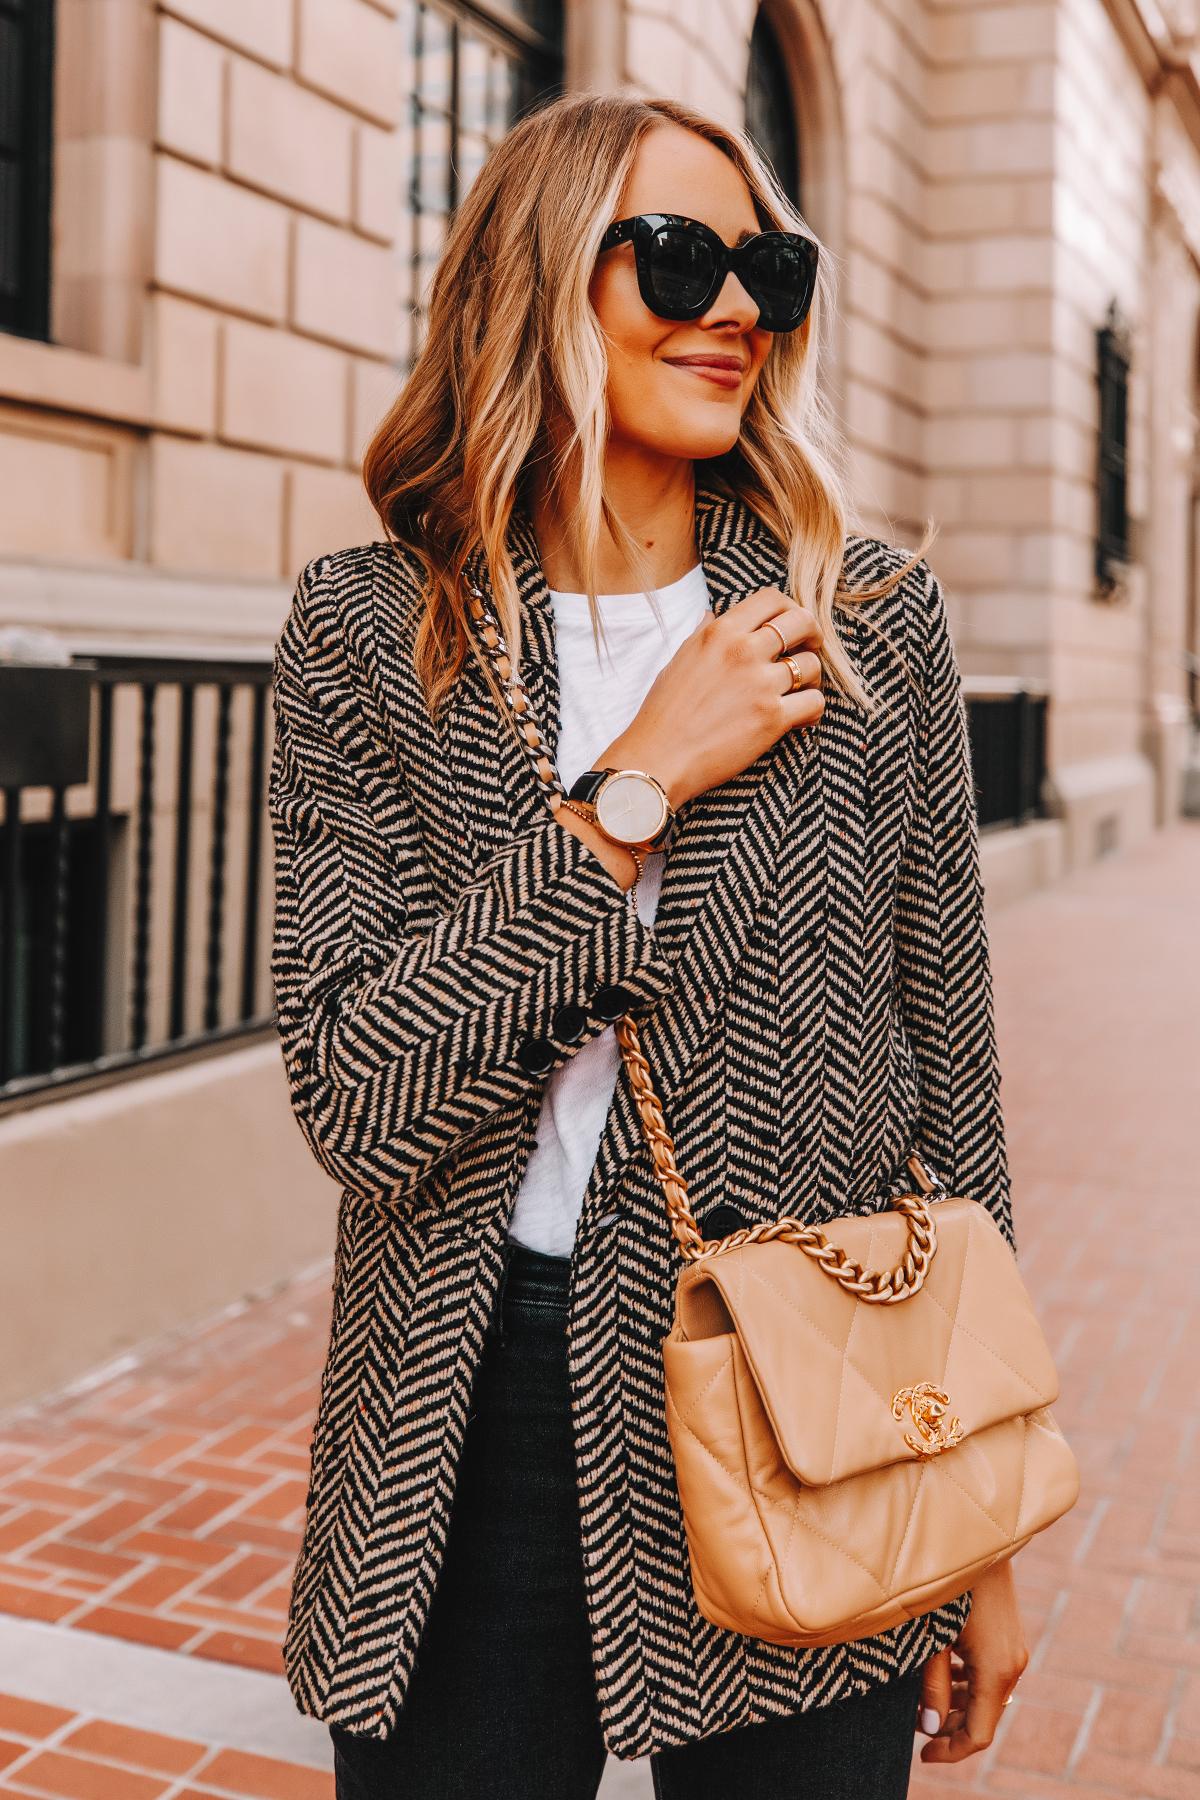 Fashion Jackson Wearing Anine Bing Black Herringbone Blazer White Tshirt Chanel 19 Beige Handbag Garmin Vivomove Luxe Smartwatch